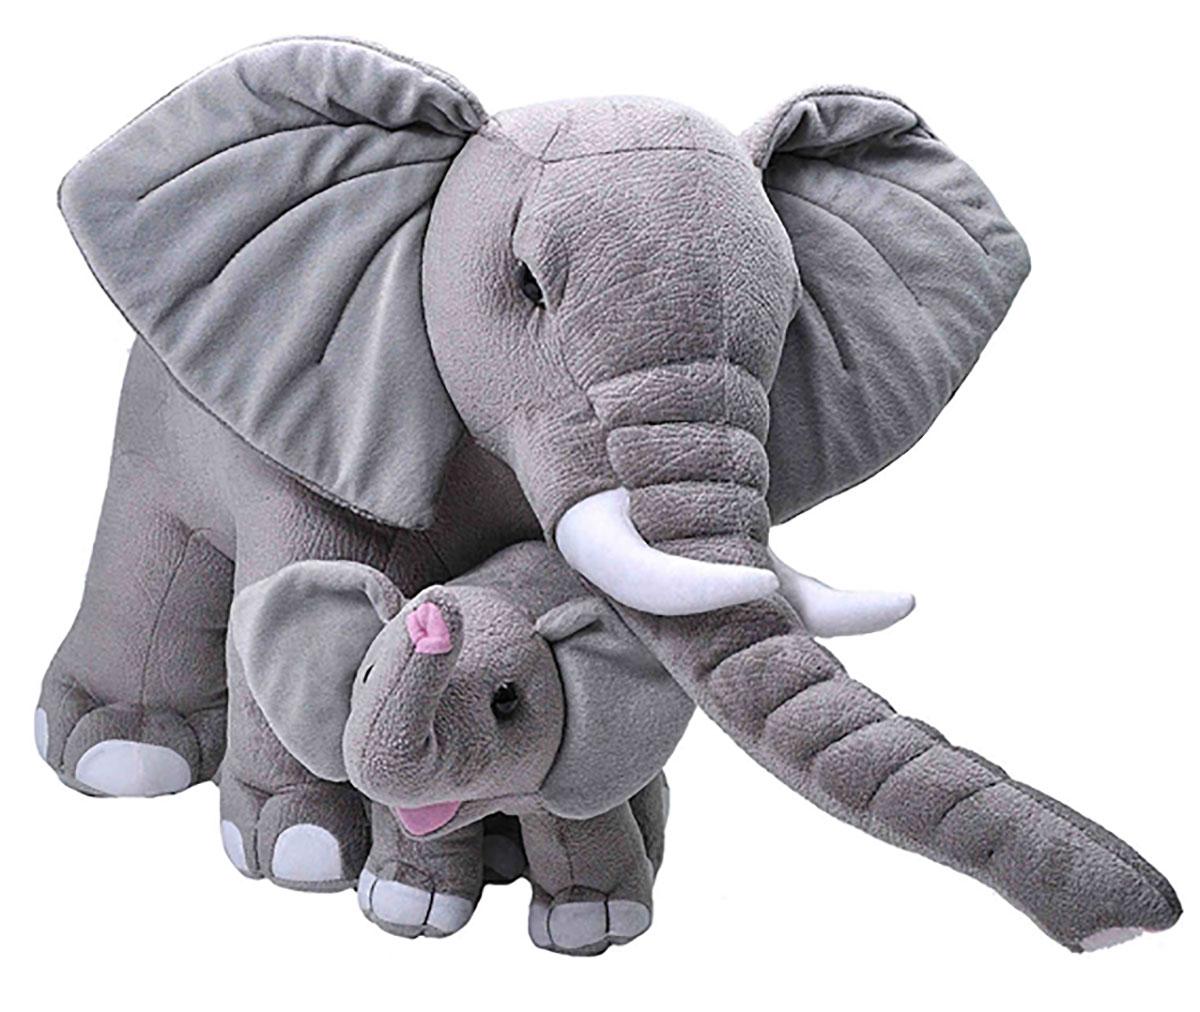 Jumbo Elefant Mom & Baby Mom ca.76cm und Baby ca.30cm by Wild Republic W24102 Plüschtier